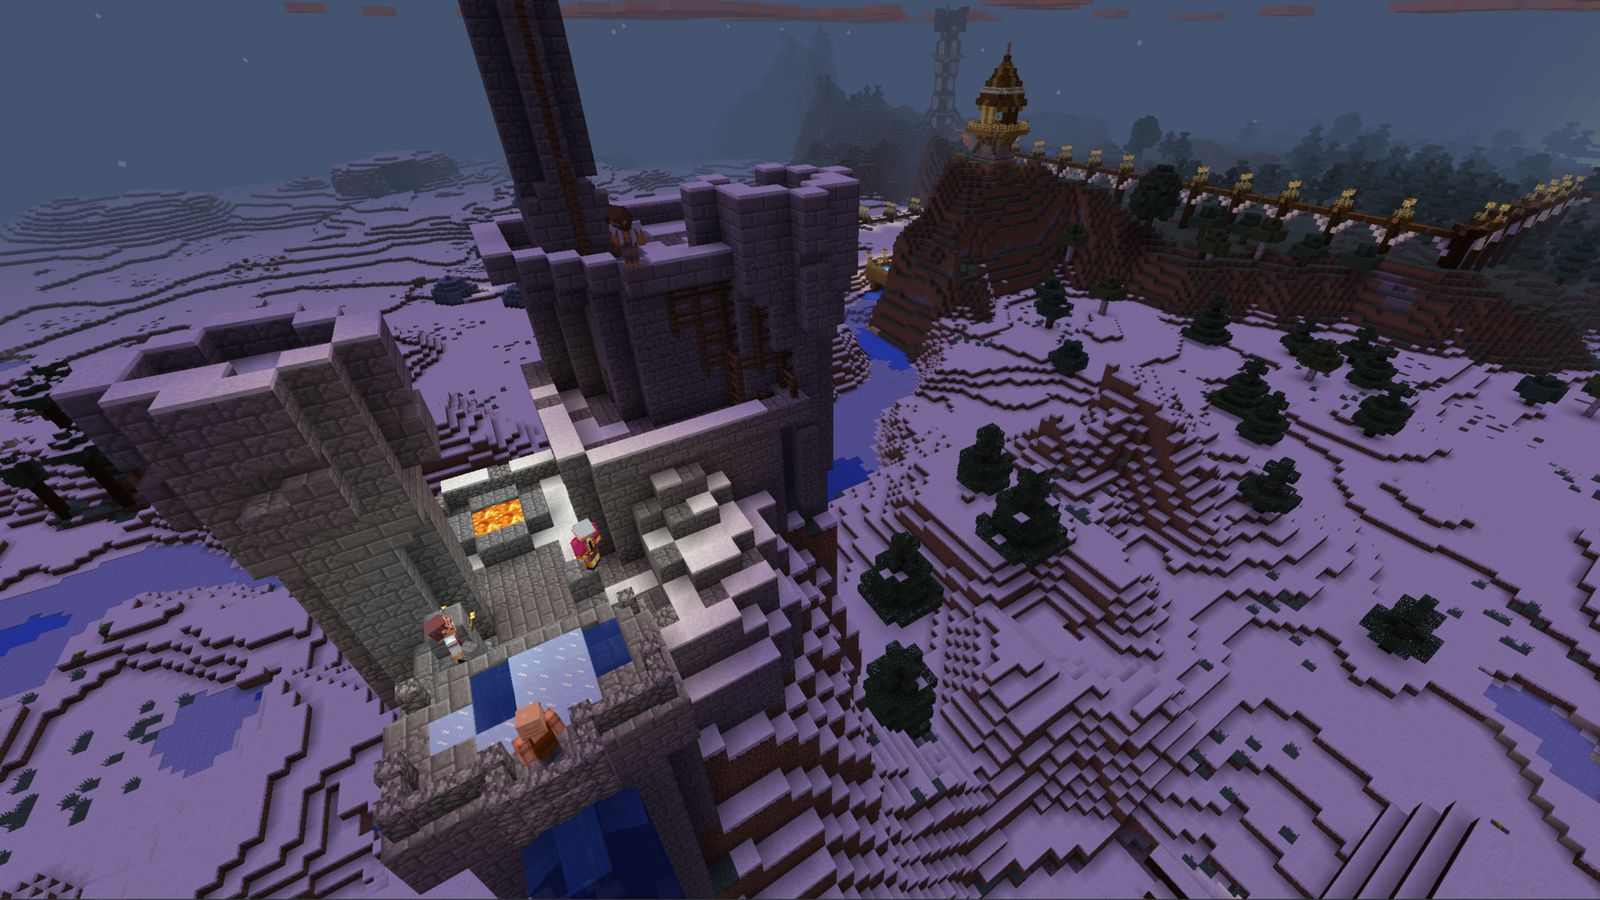 Minecraft sales hit 122M copies